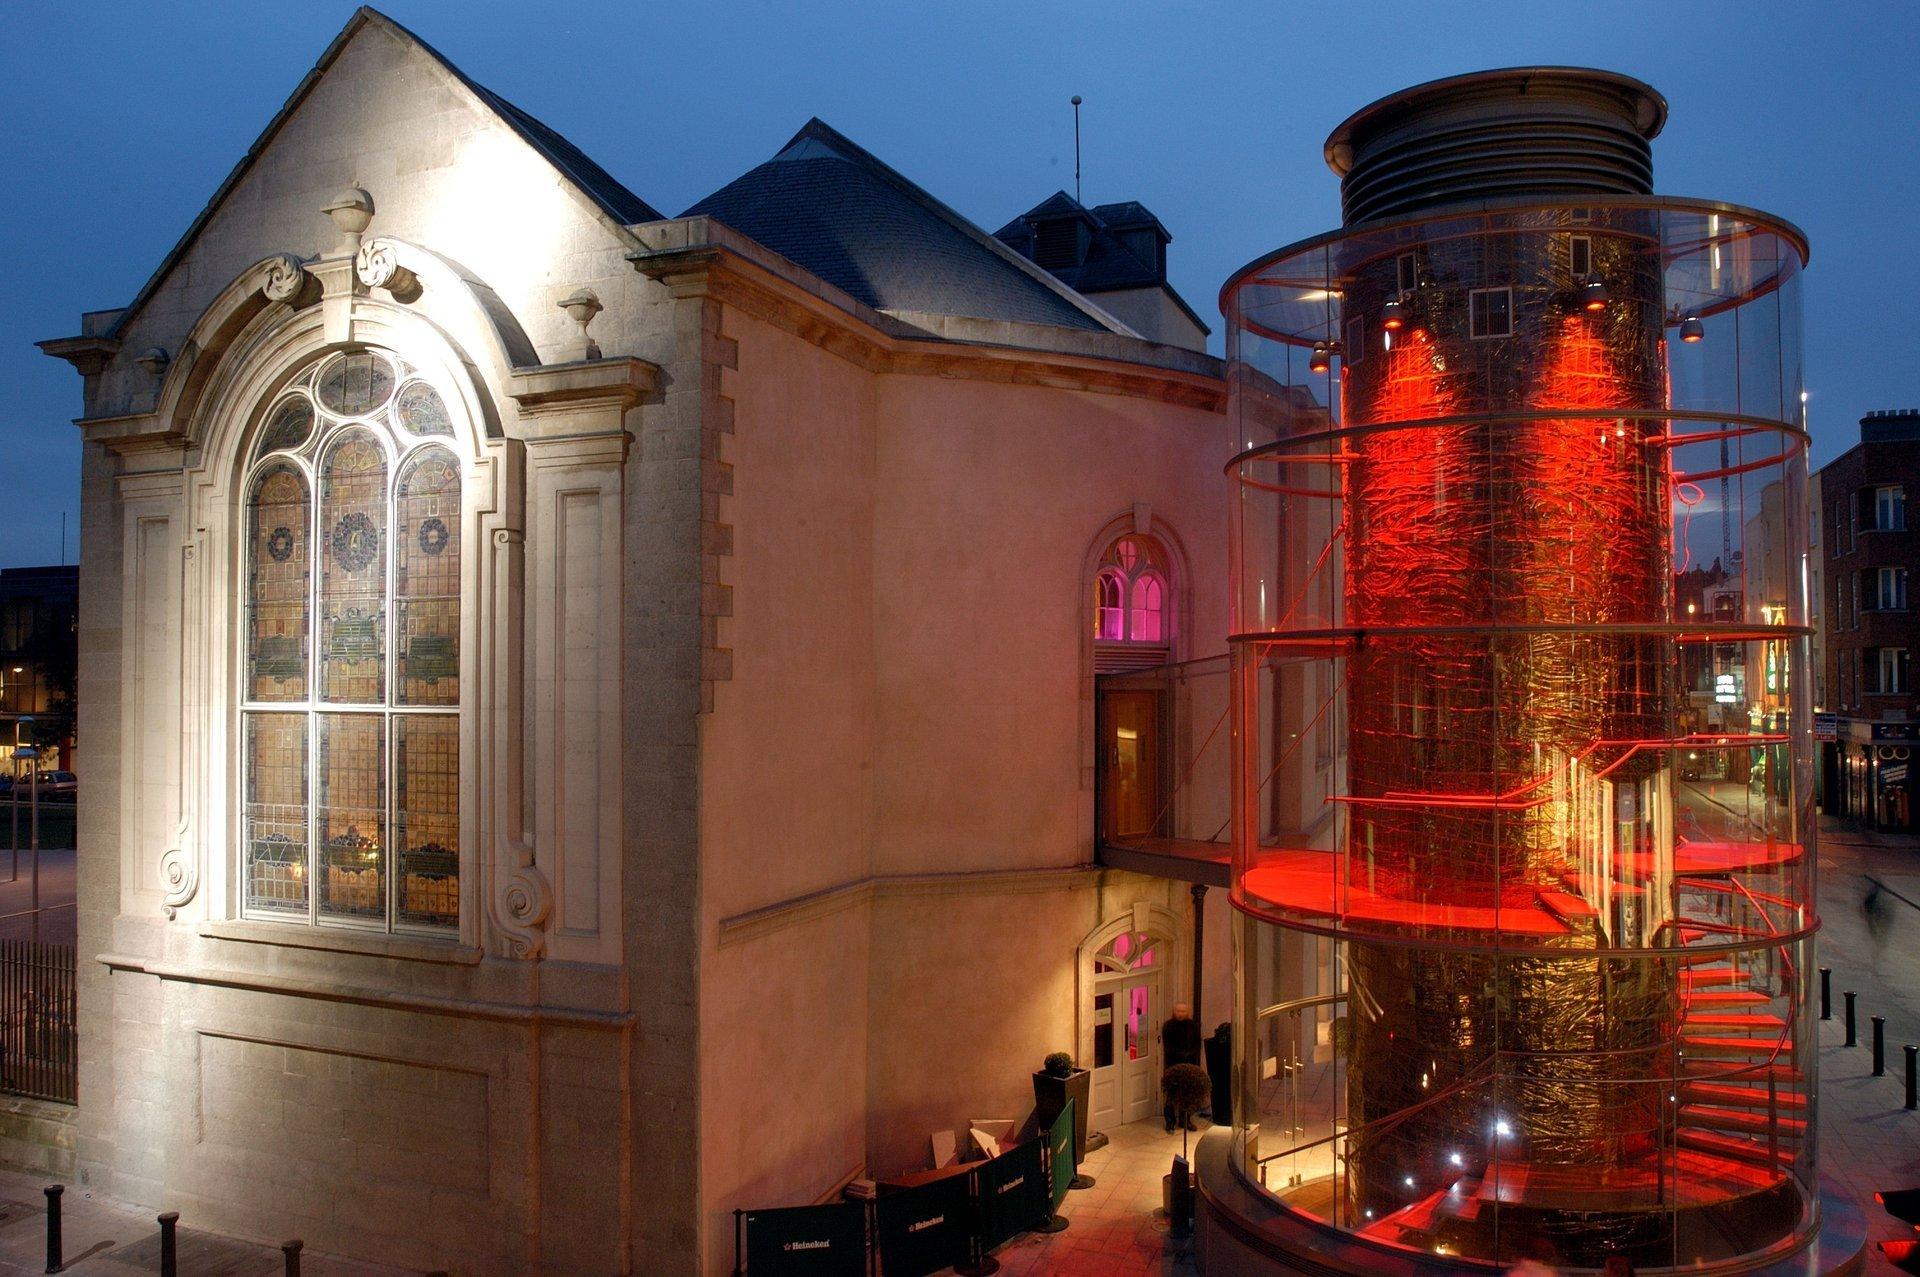 The Church Bar in Dublin 2020 - Best Time